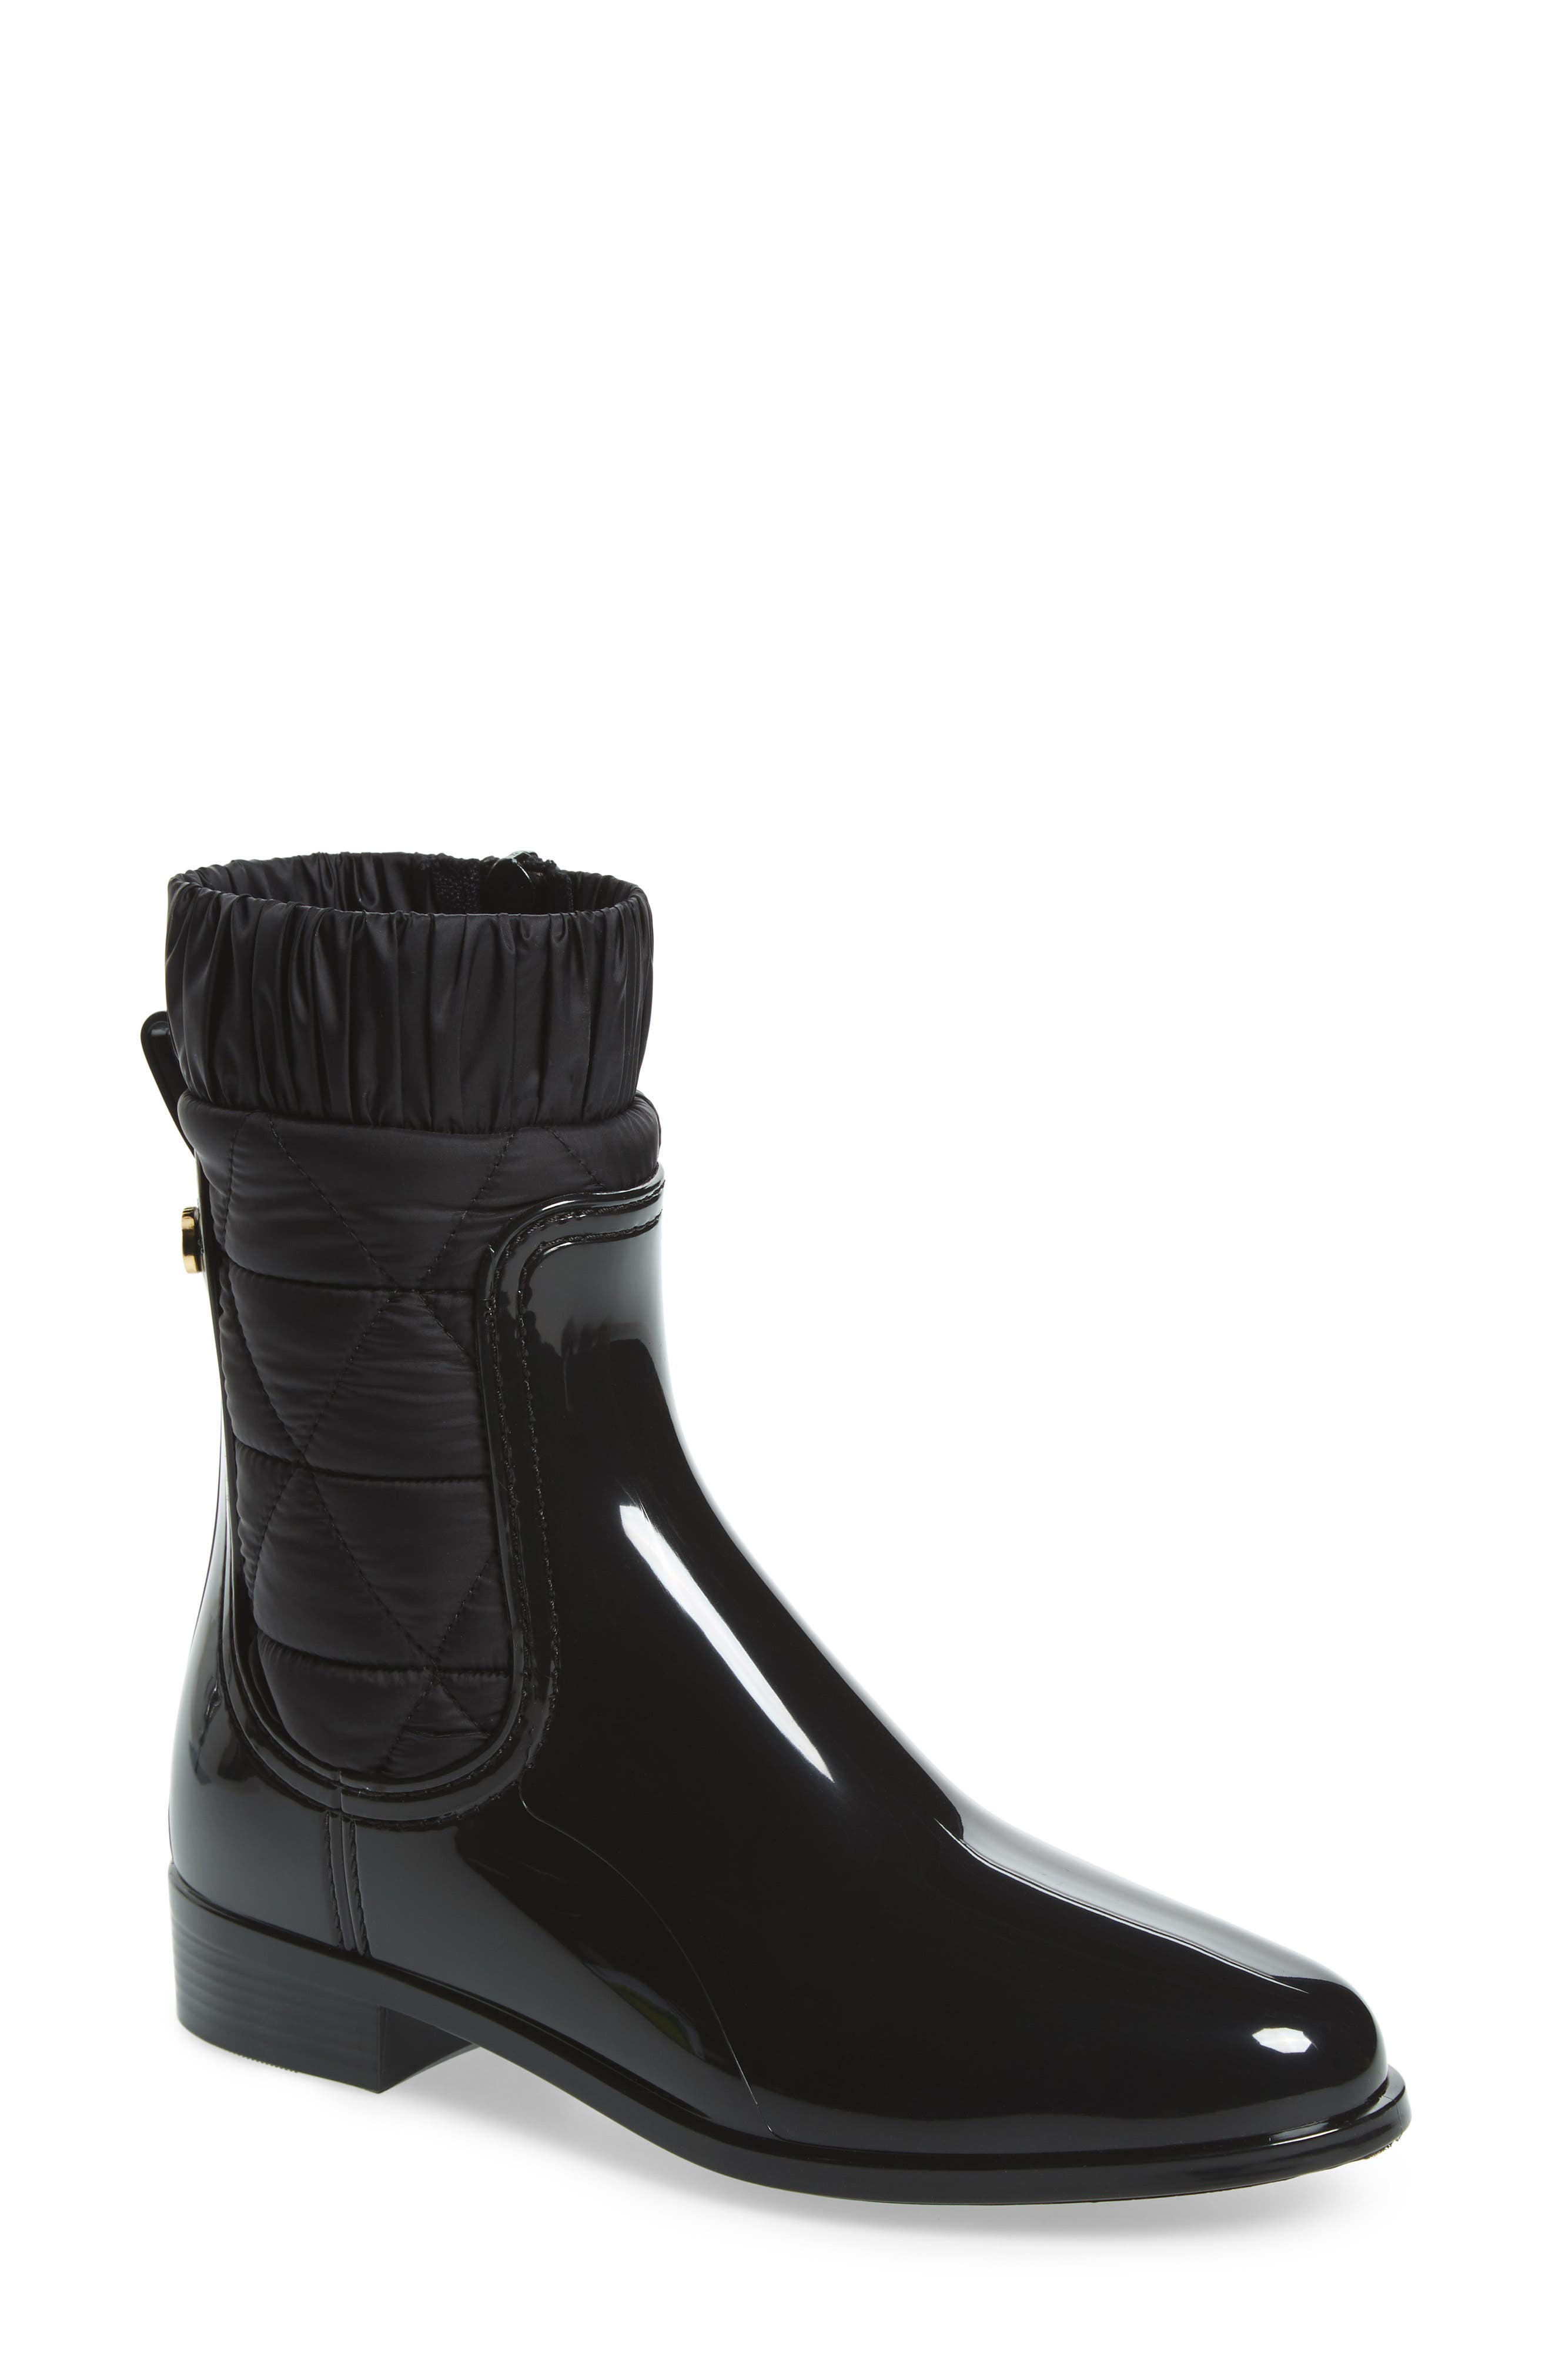 Adele Waterproof Boot,                         Main,                         color, BLACK GLOSS